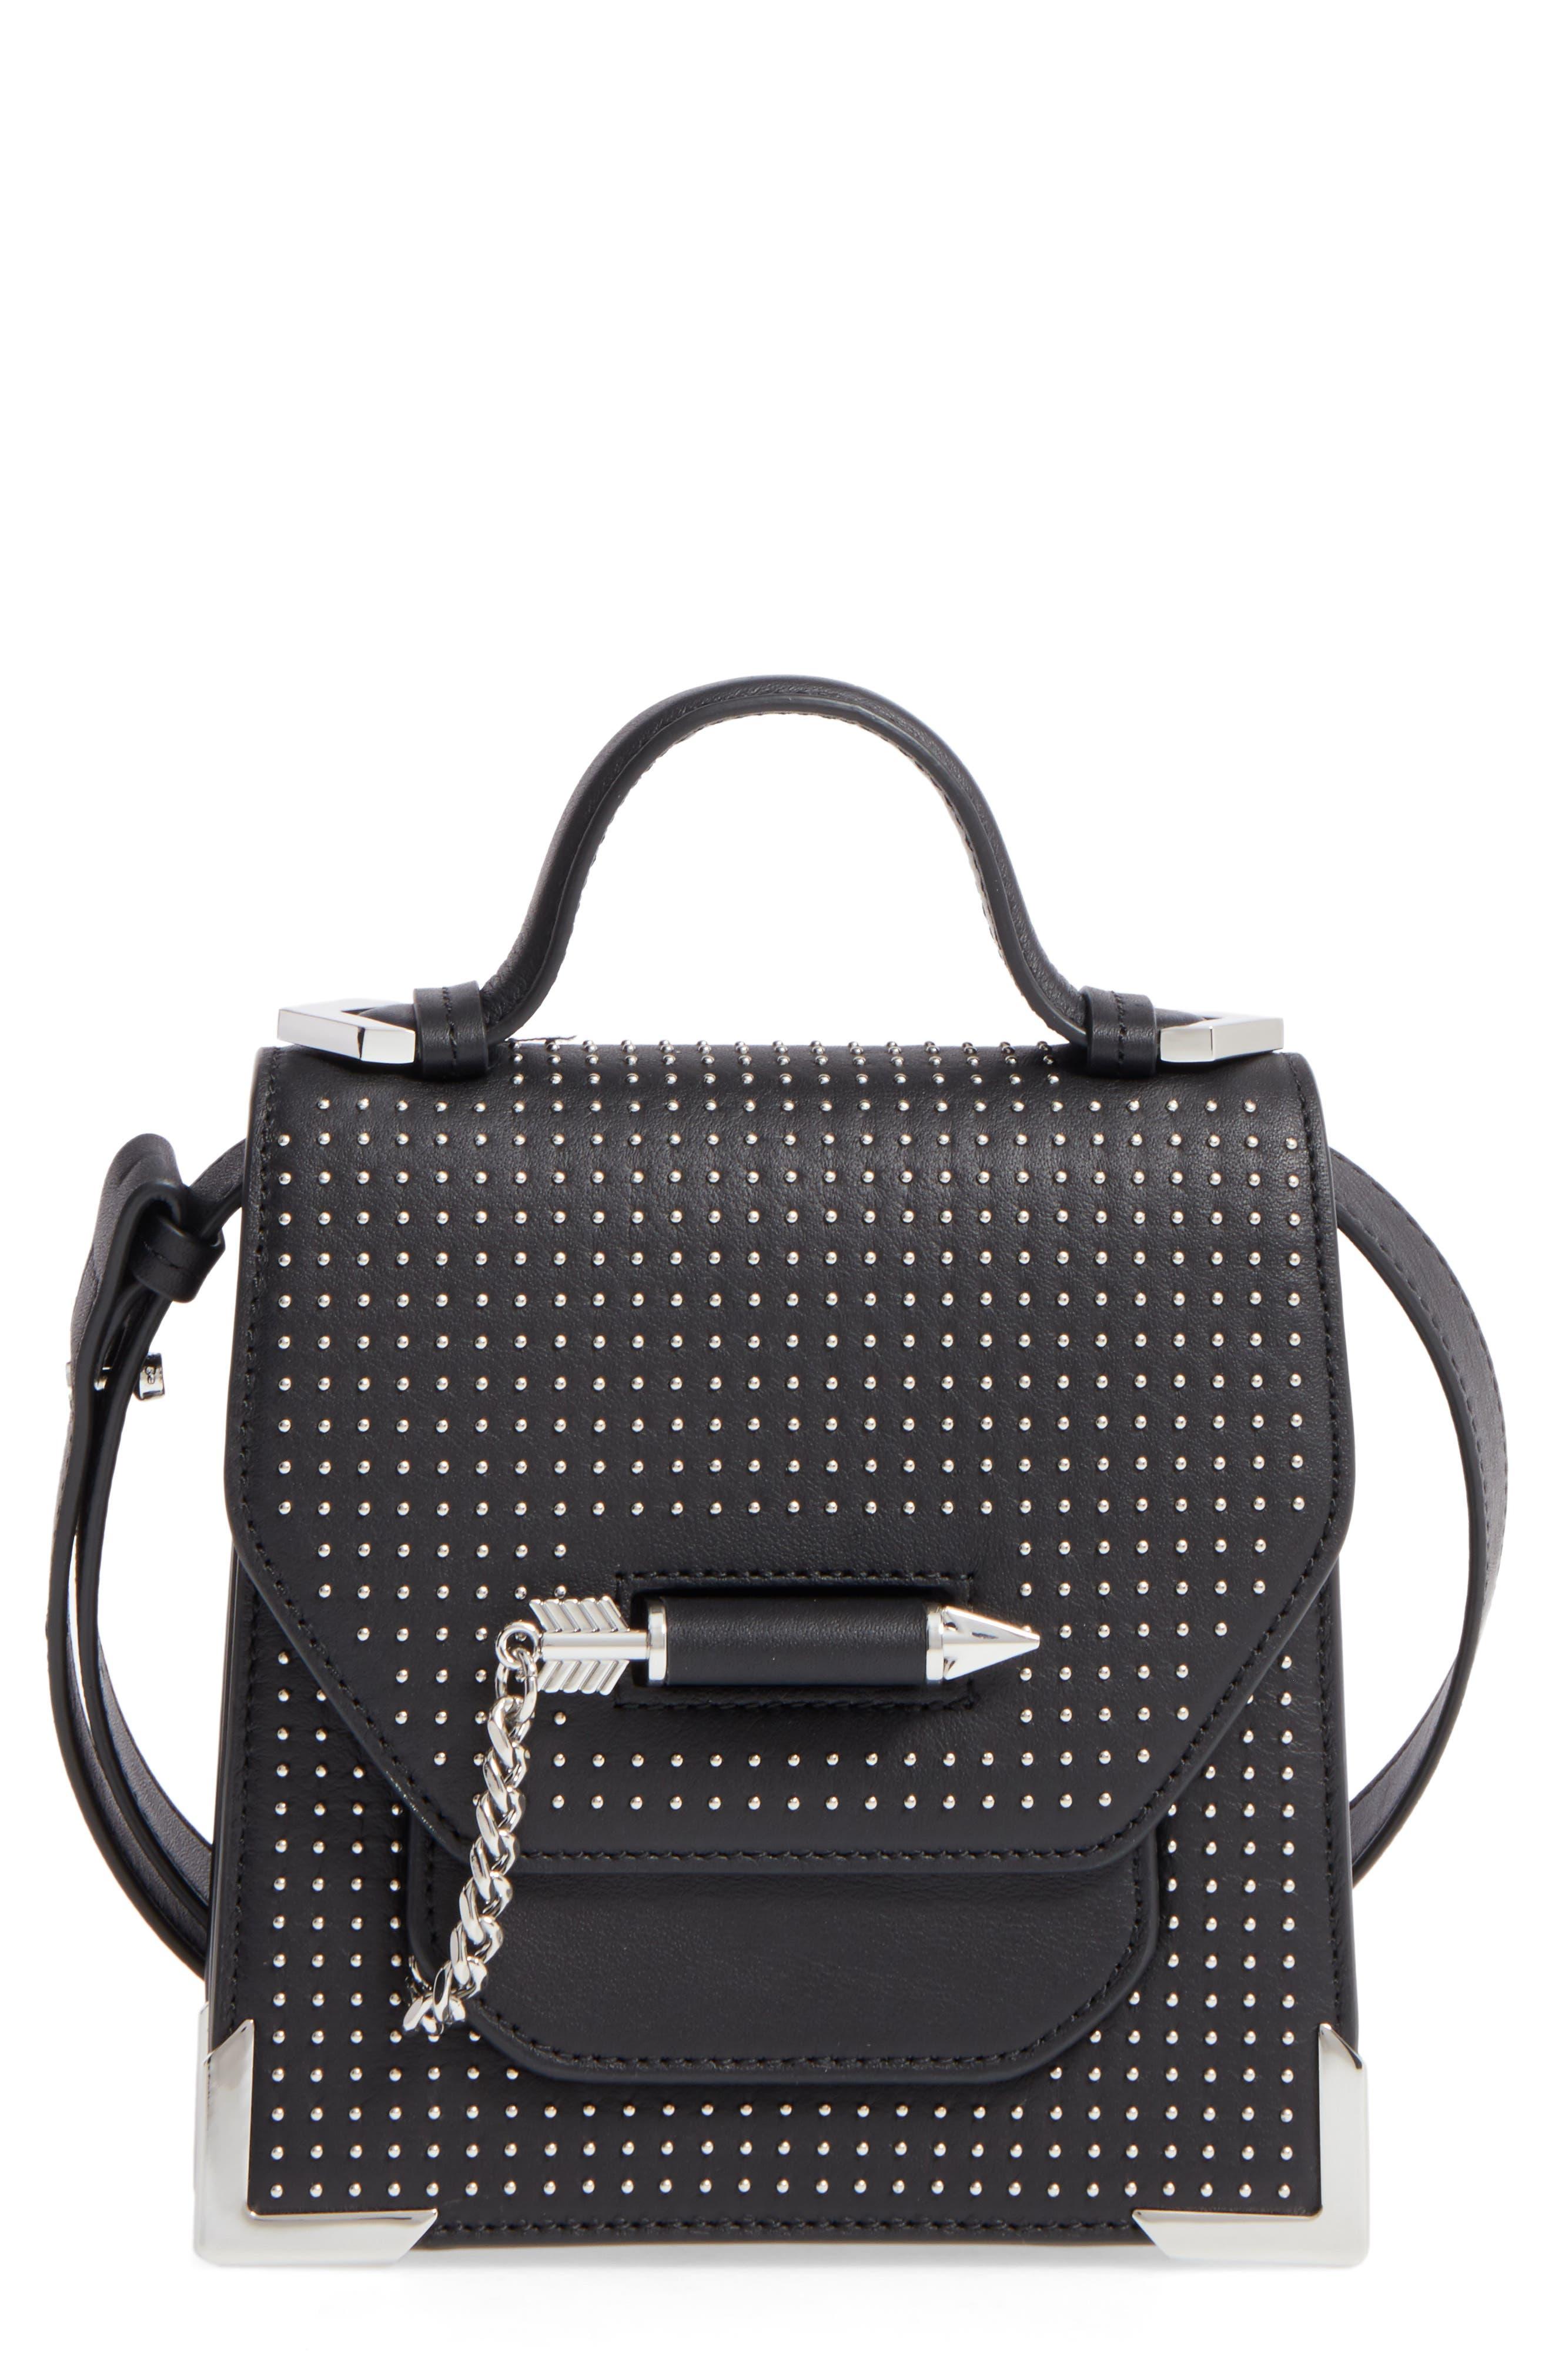 MACKAGE Mini Rubie Leather Crossbody Bag, Main, color, 001